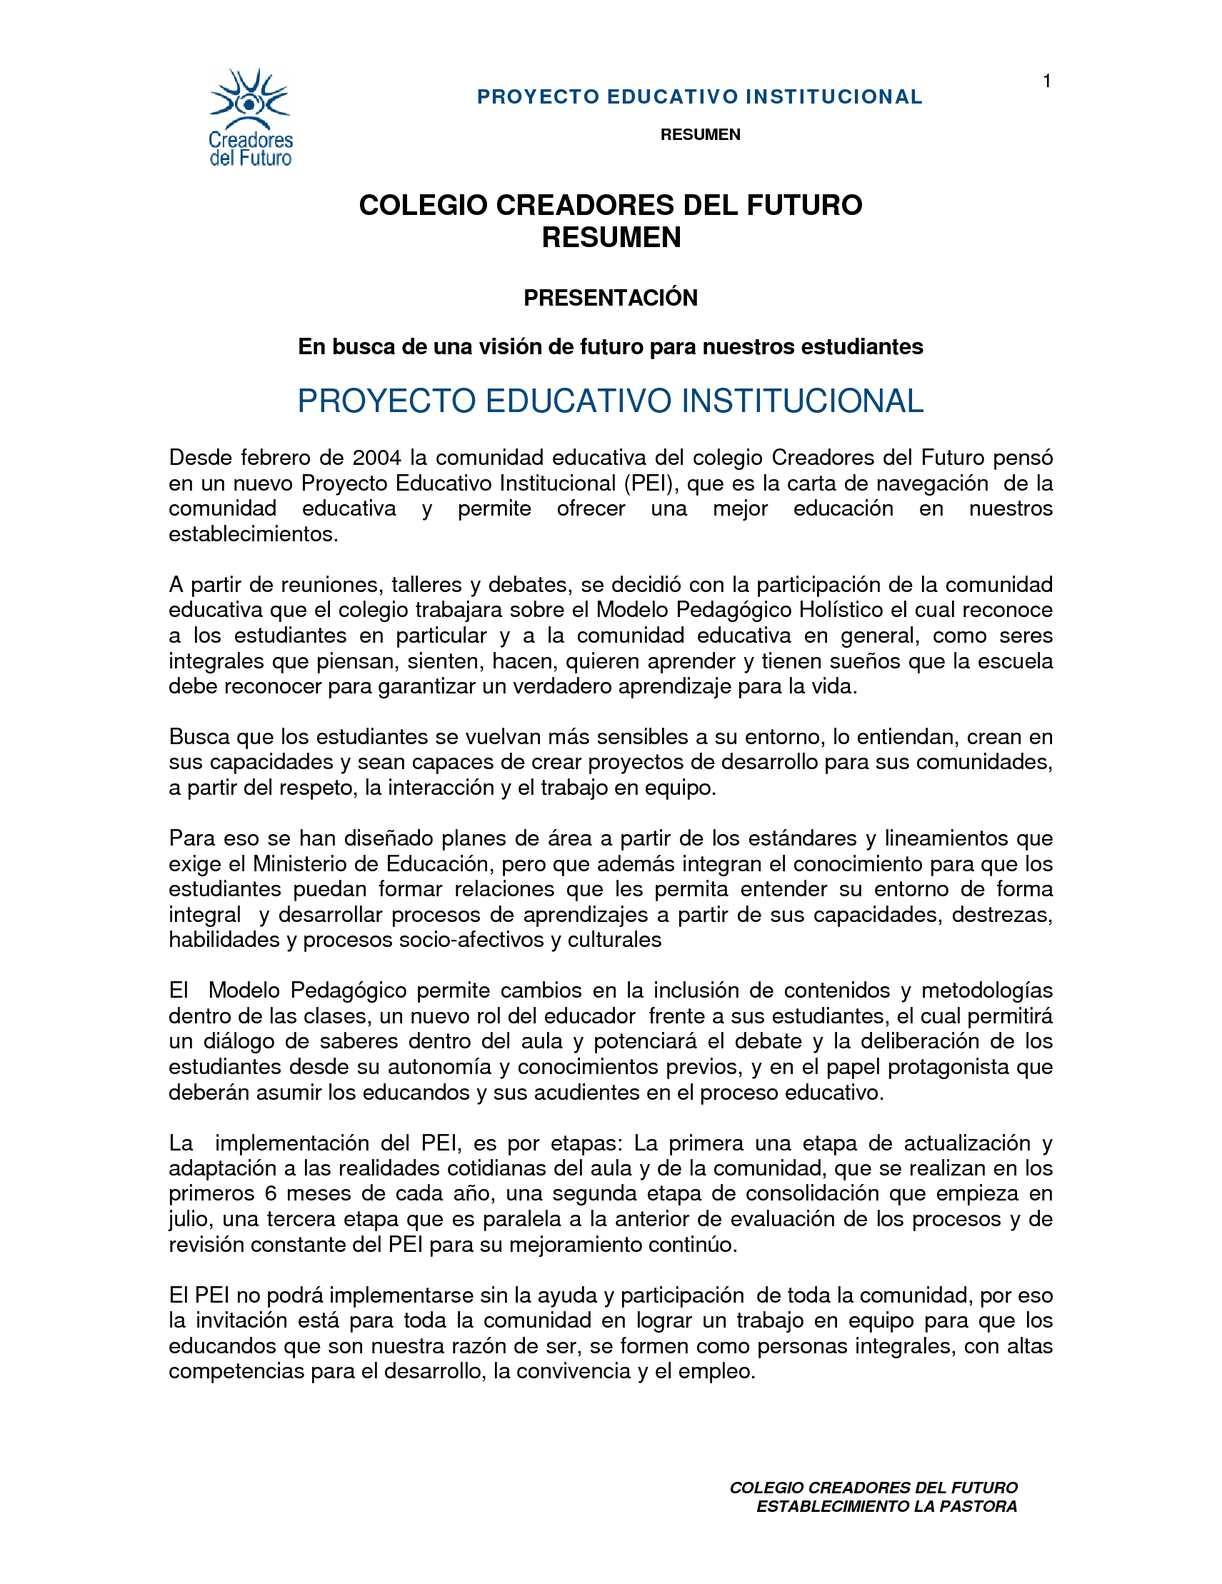 Calaméo - Resumen PEI / Establecimiento La Pastora